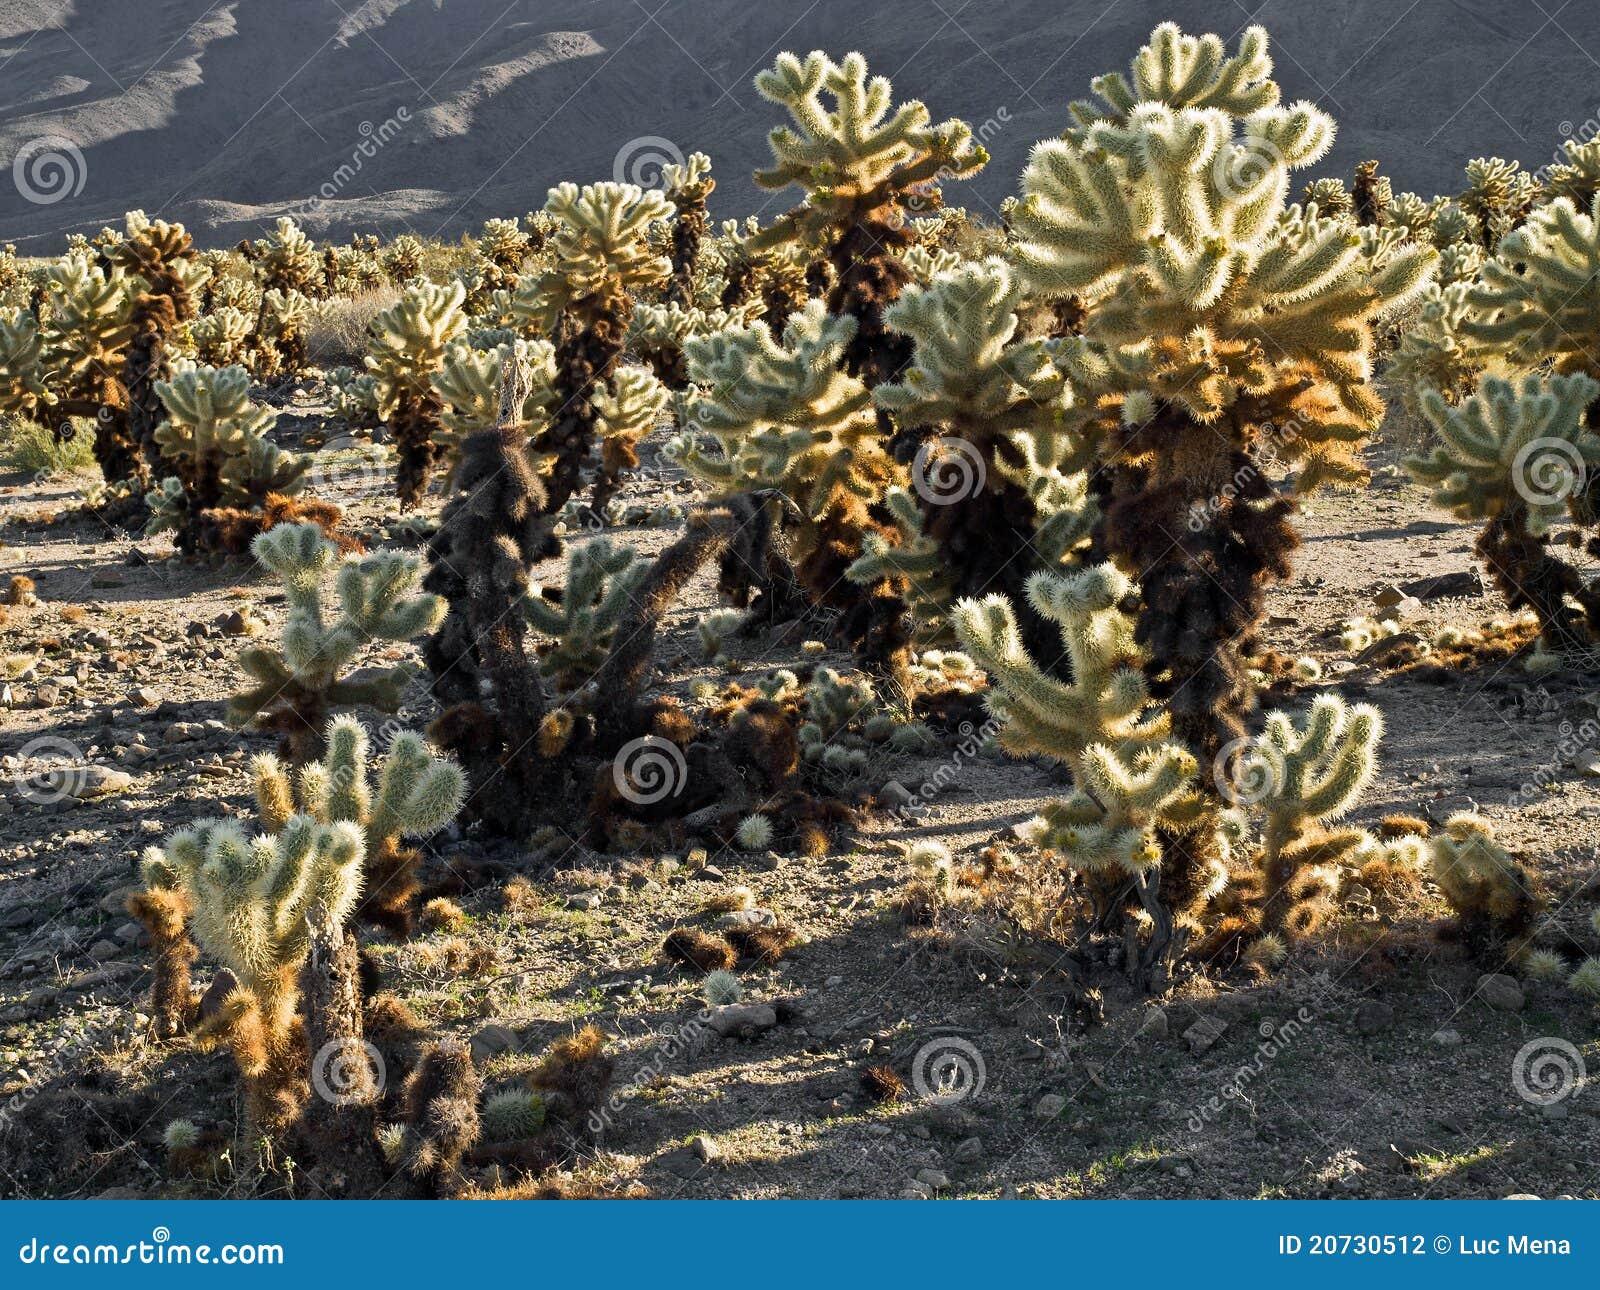 Cholla Cactus Garden In Joshua Tree National Park Stock Photography Image 20730512